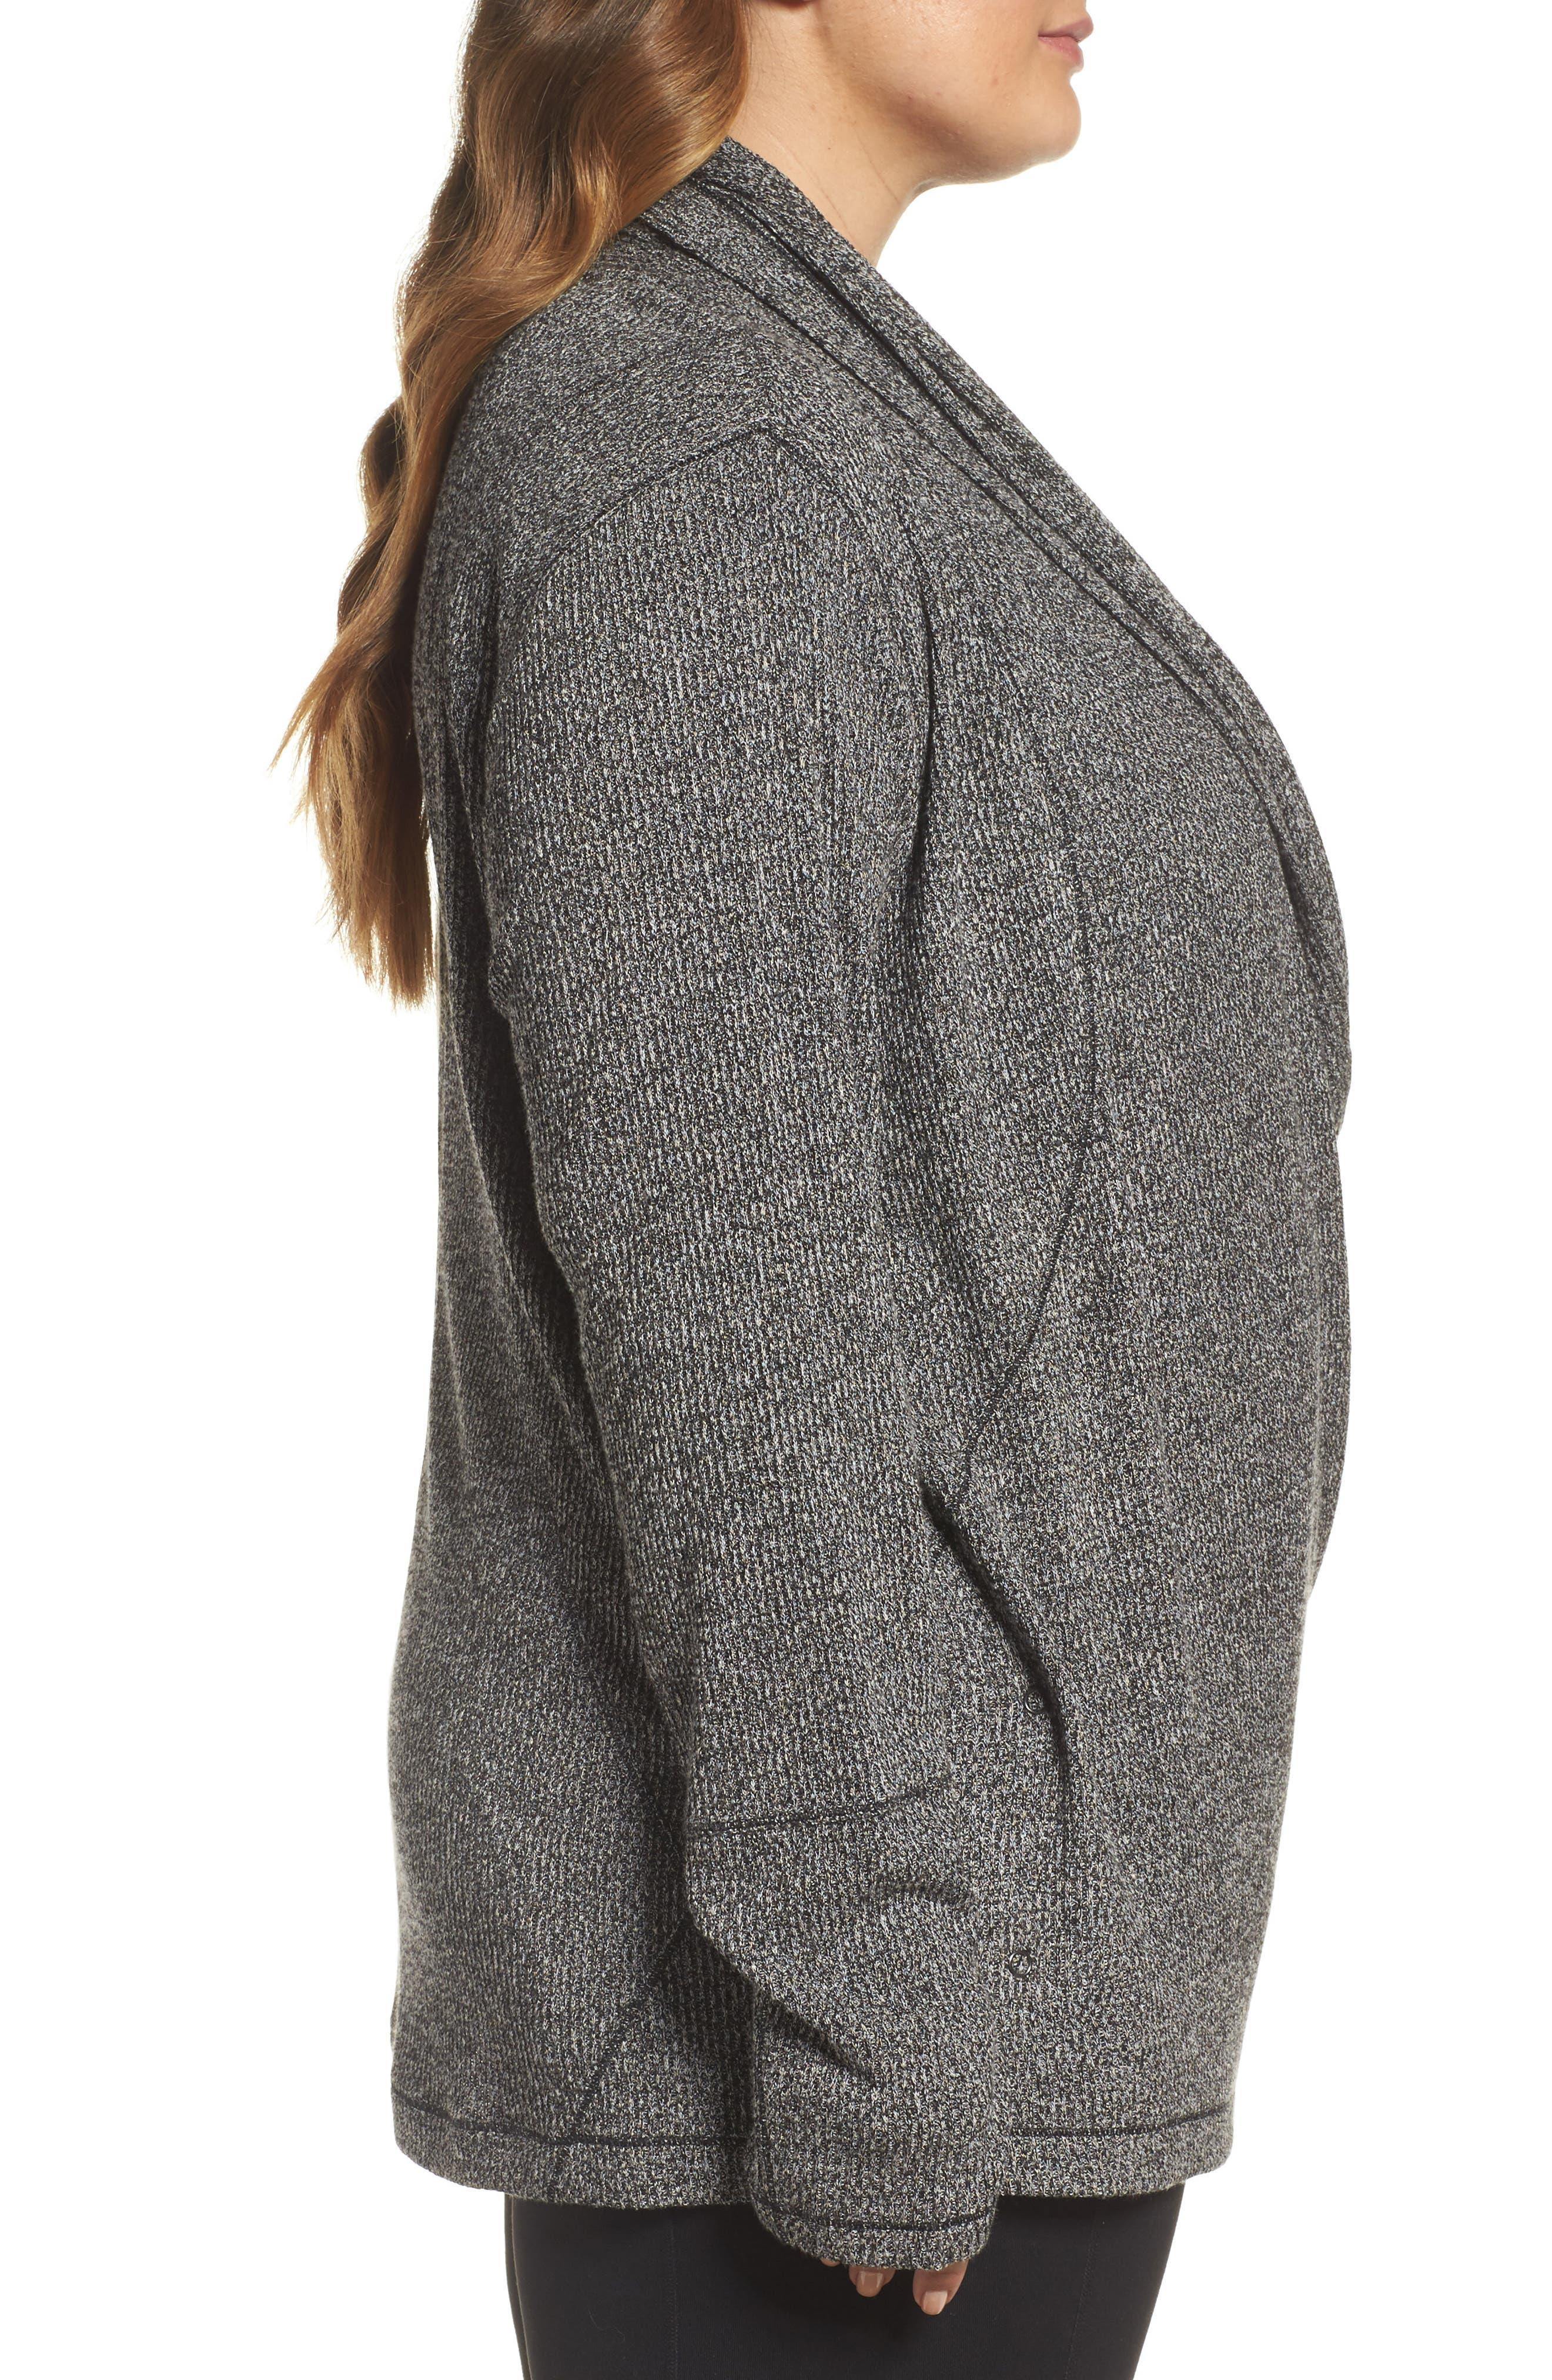 Alternate Image 3  - Zella Enlighten Me Ribbed Cardigan (Plus Size)